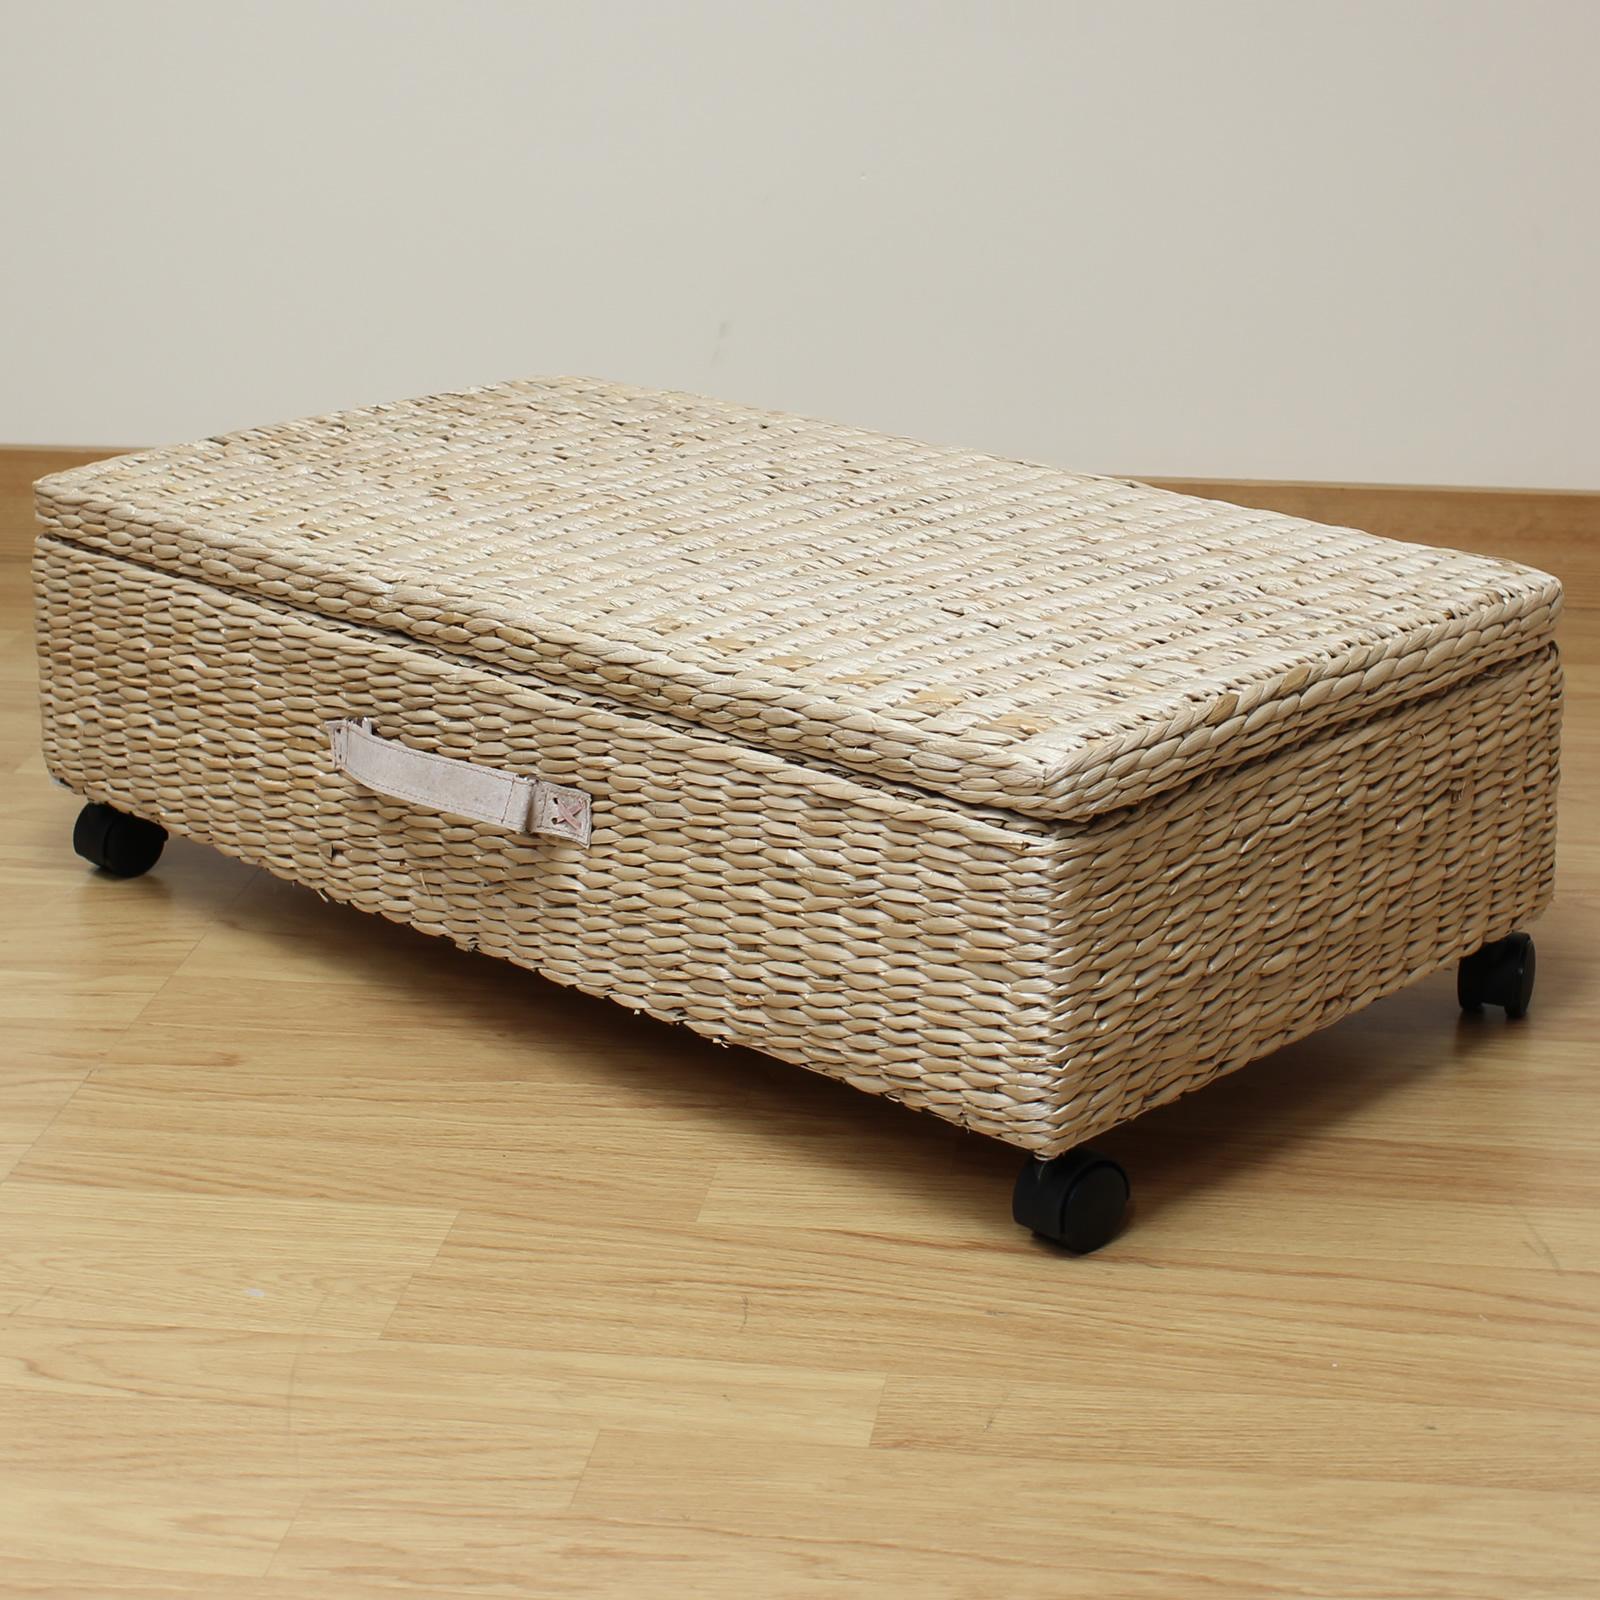 Sentinel Hartleys Large Under Bed Storage Box/Chest Shoes/Bedding/Blanket  Underbed Trunk